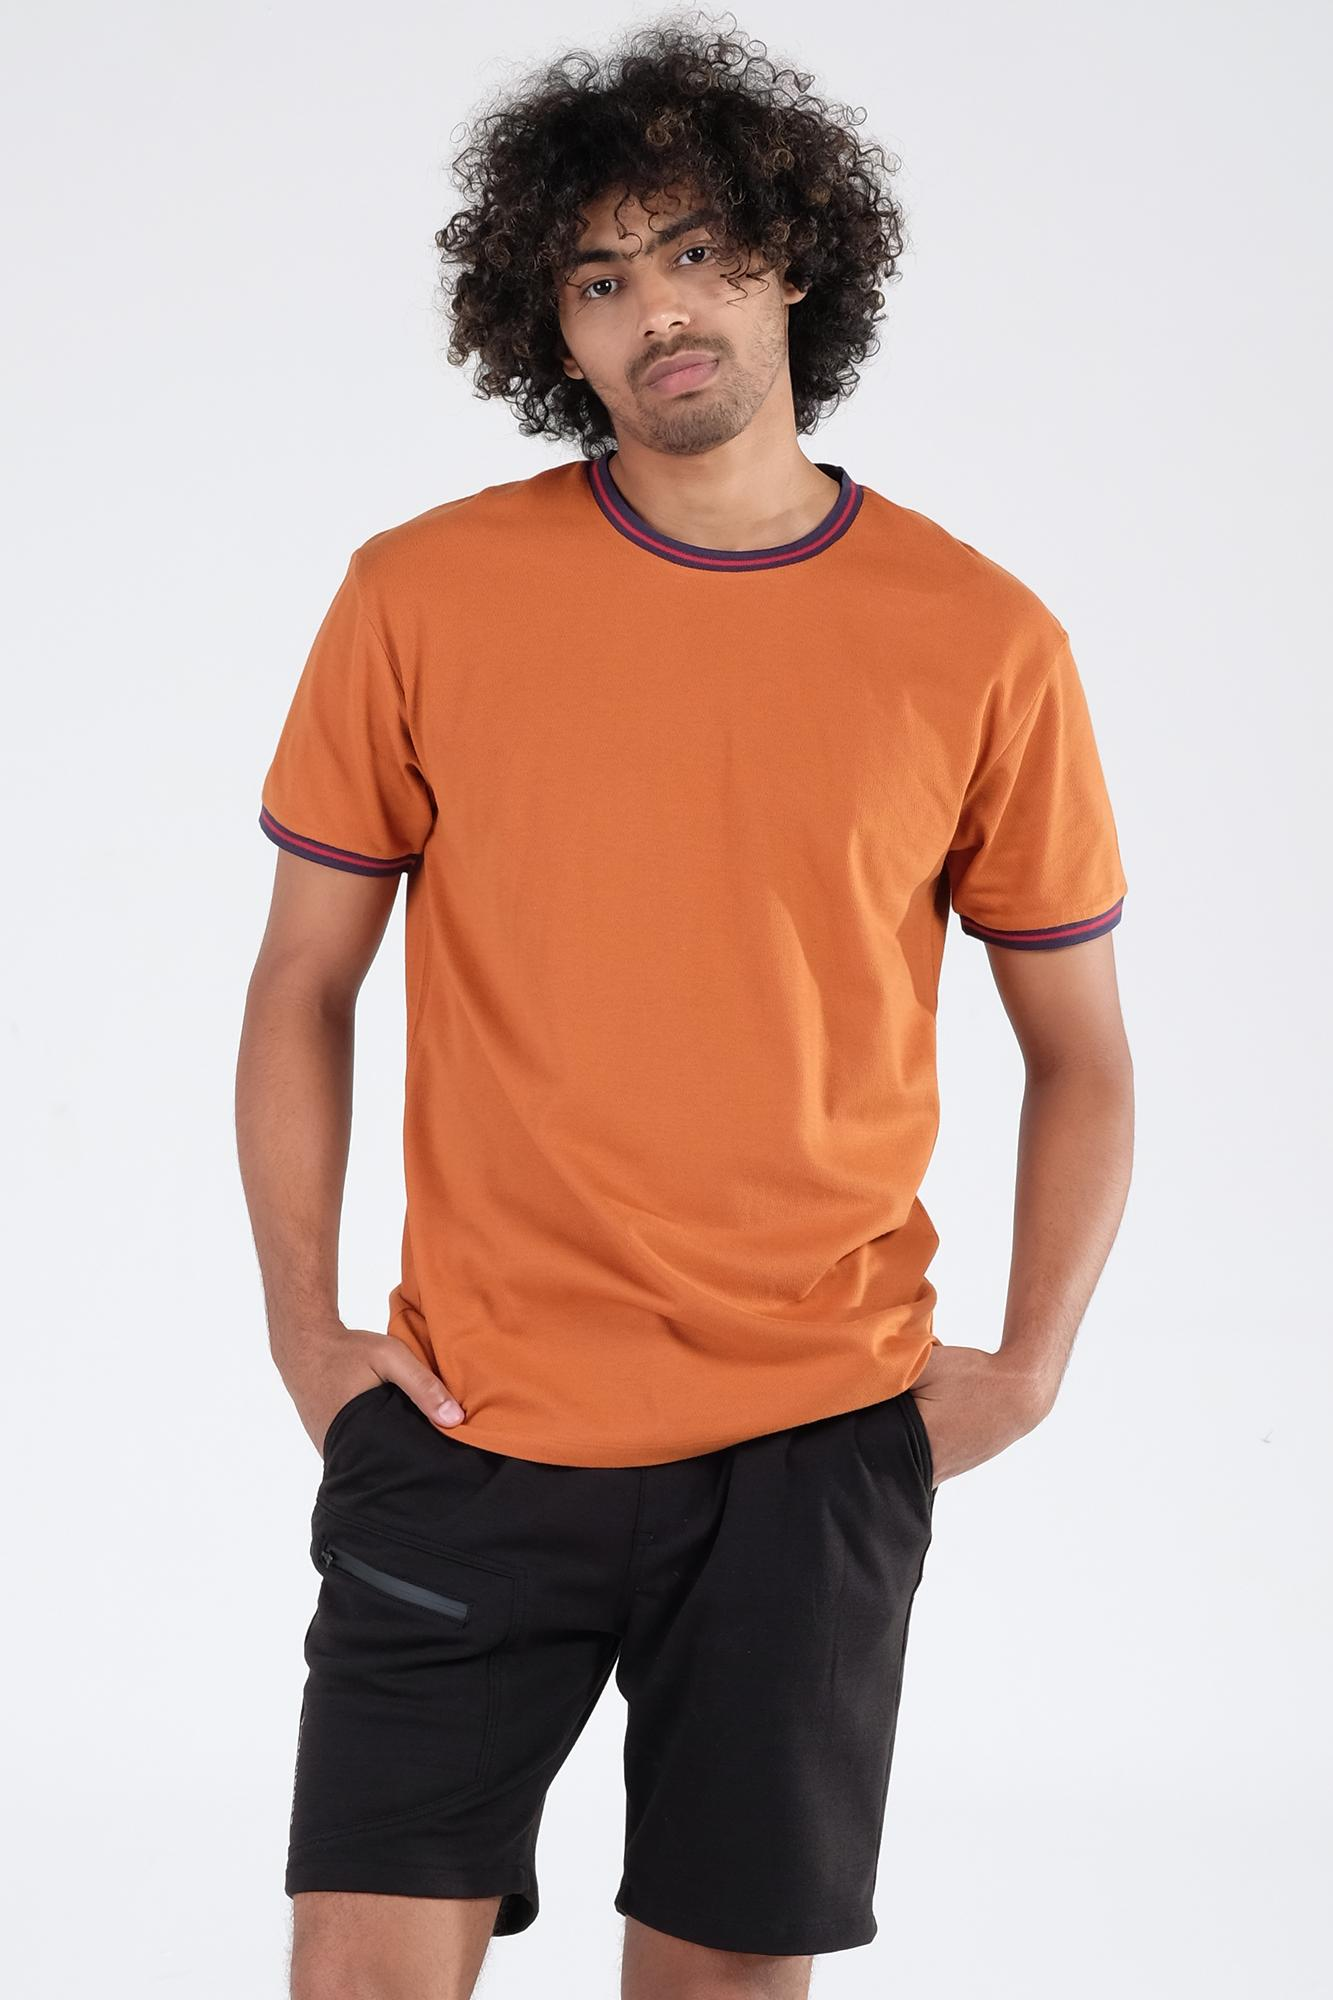 fef5cb762a Penshoppe Philippines - Penshoppe T-Shirt Clothing for Men for sale ...